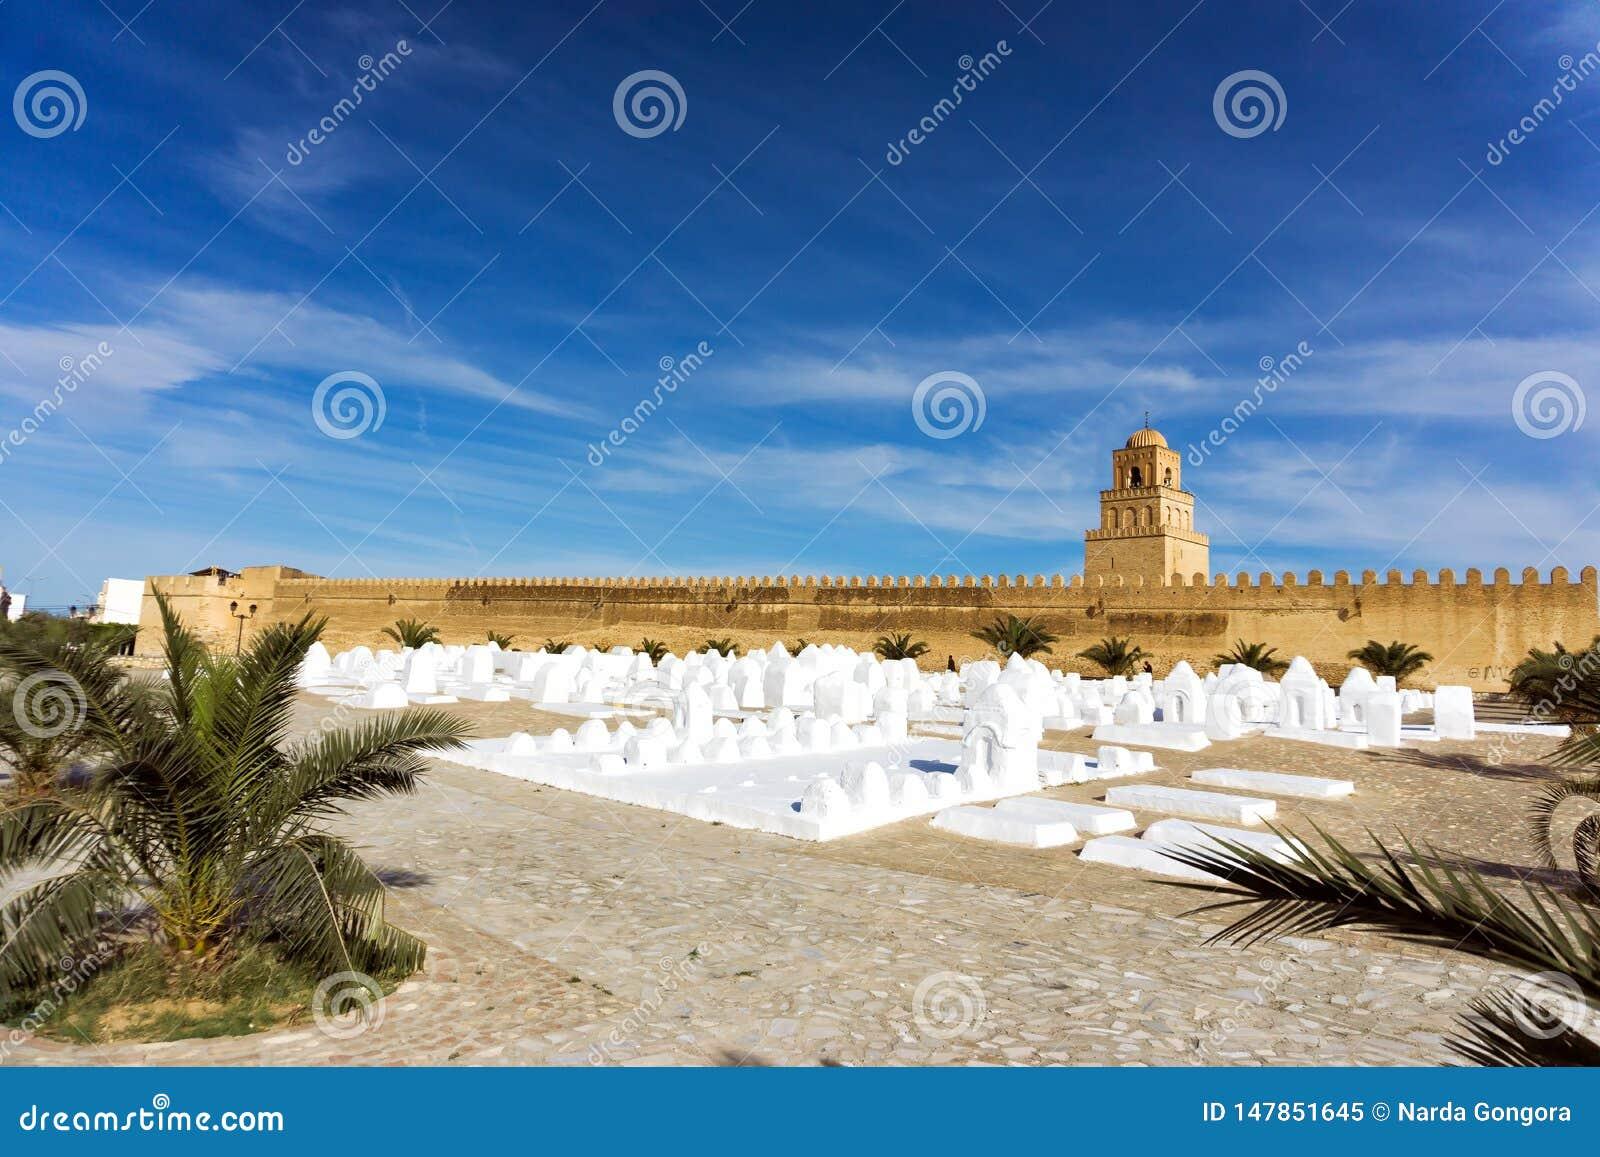 De Begraafplaats van Ouledfarhane met achtergrond van de Grote Moskee in Kairouan, Tunesië